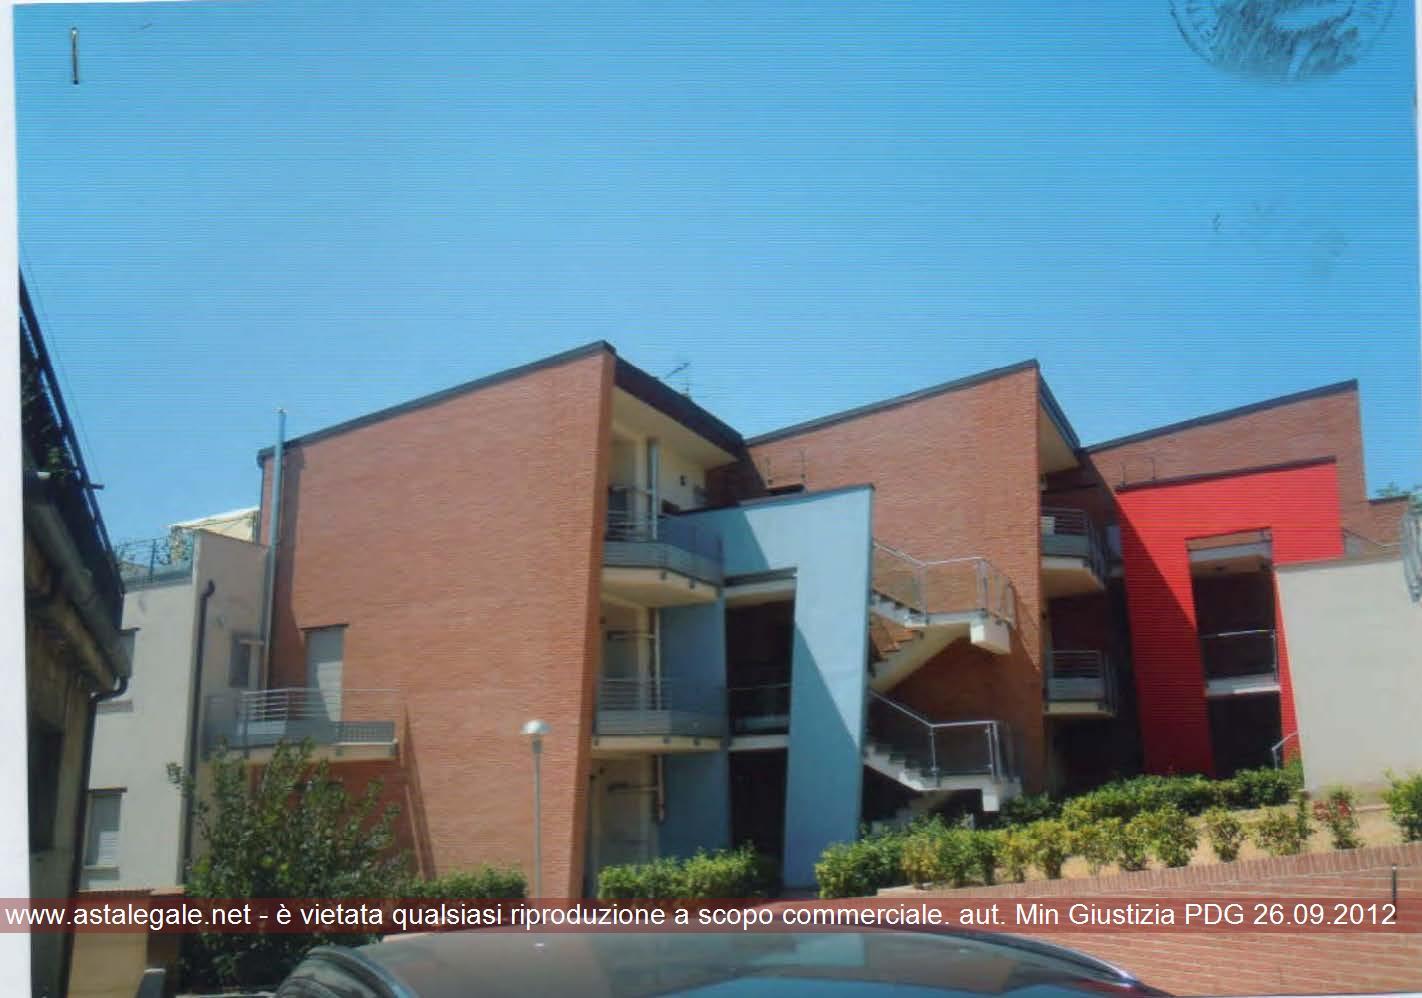 Fermignano (PU) Via Falasconi 25